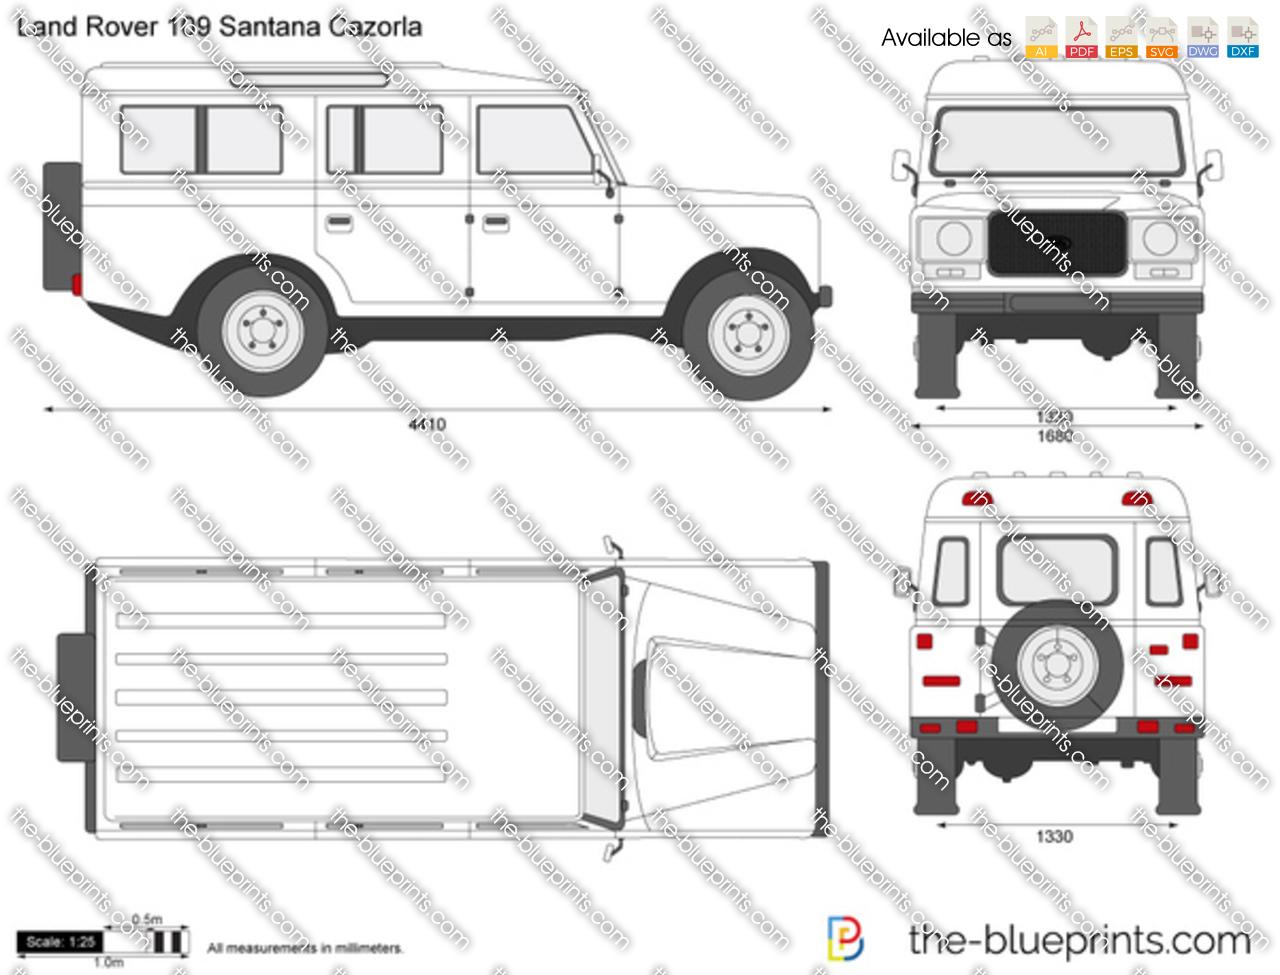 Land Rover 109 Santana Cazorla vector drawing